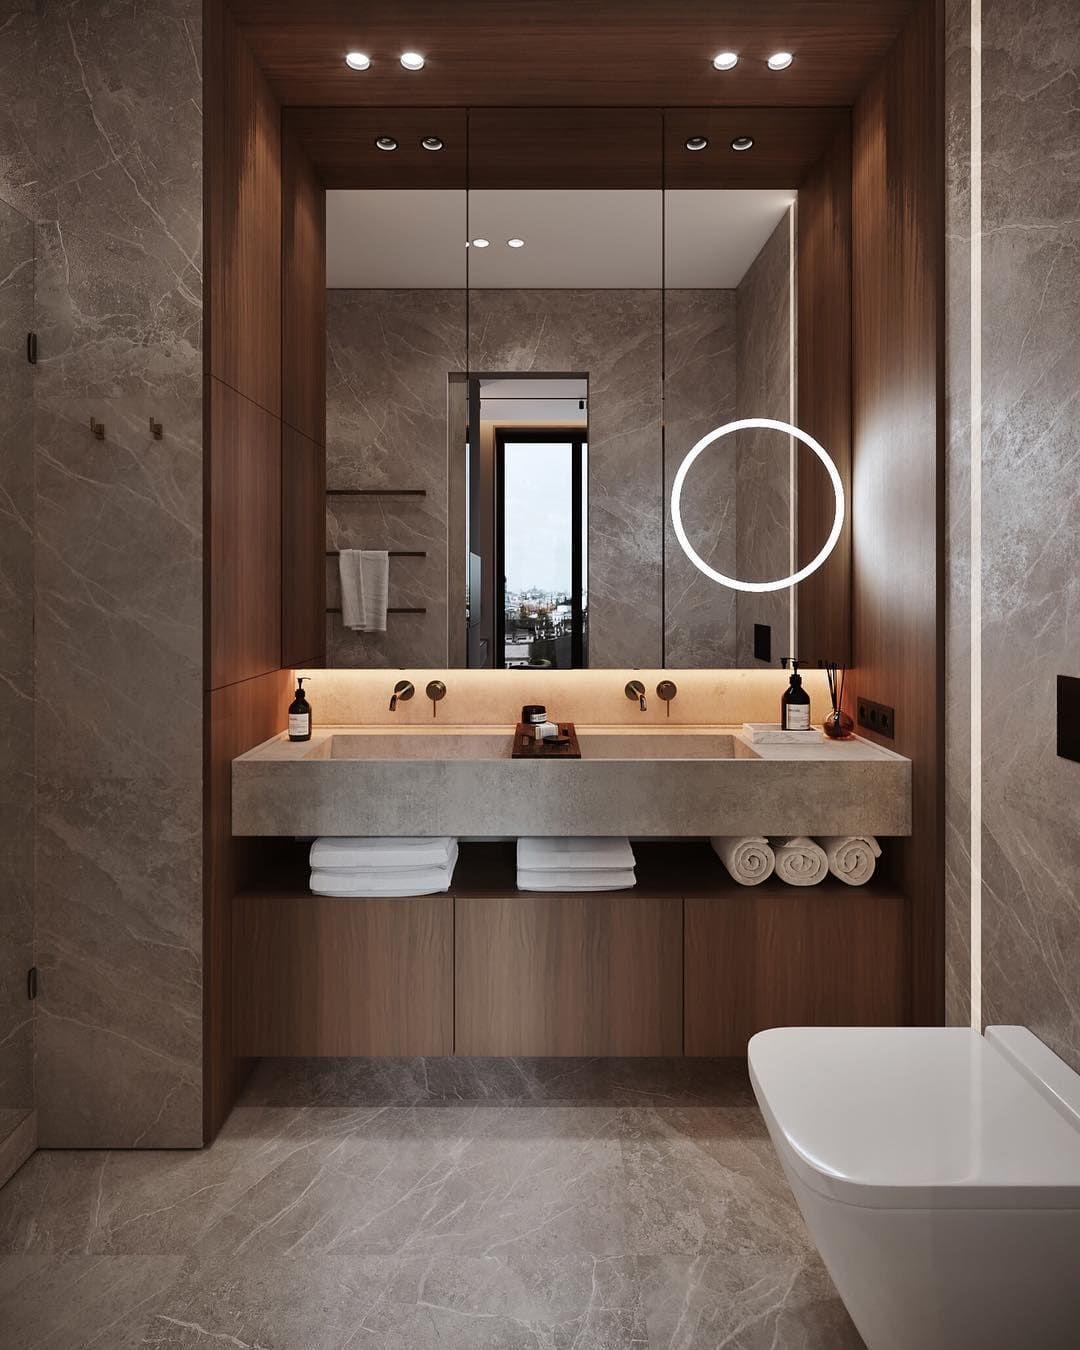 Minimal Interior Design Inspiration In 2020 Restroom Design